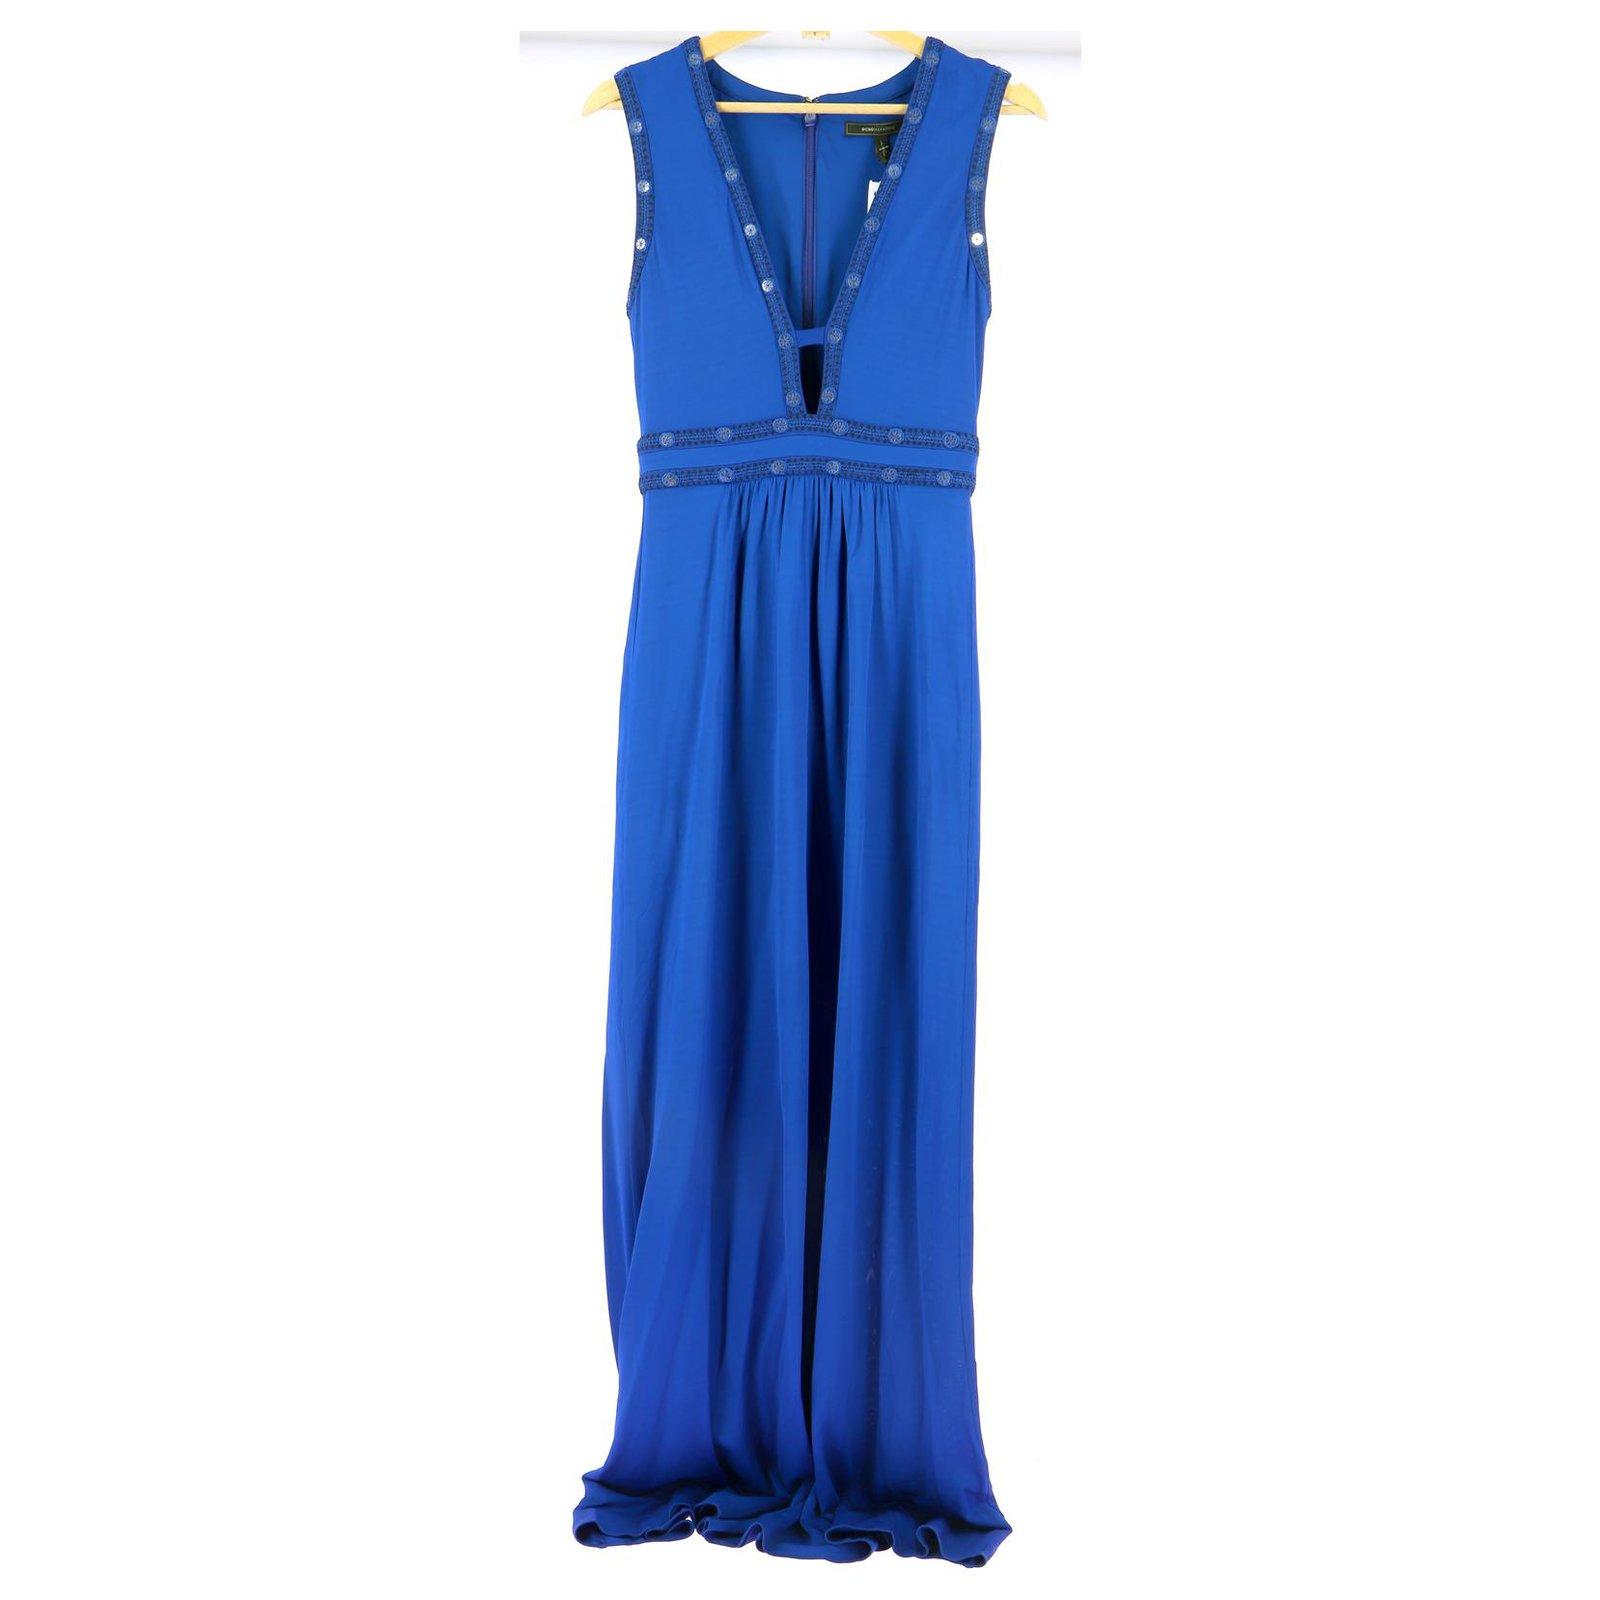 Bcbg Max Azria Robe Dresses Rayon Blue Ref 217998 Joli Closet